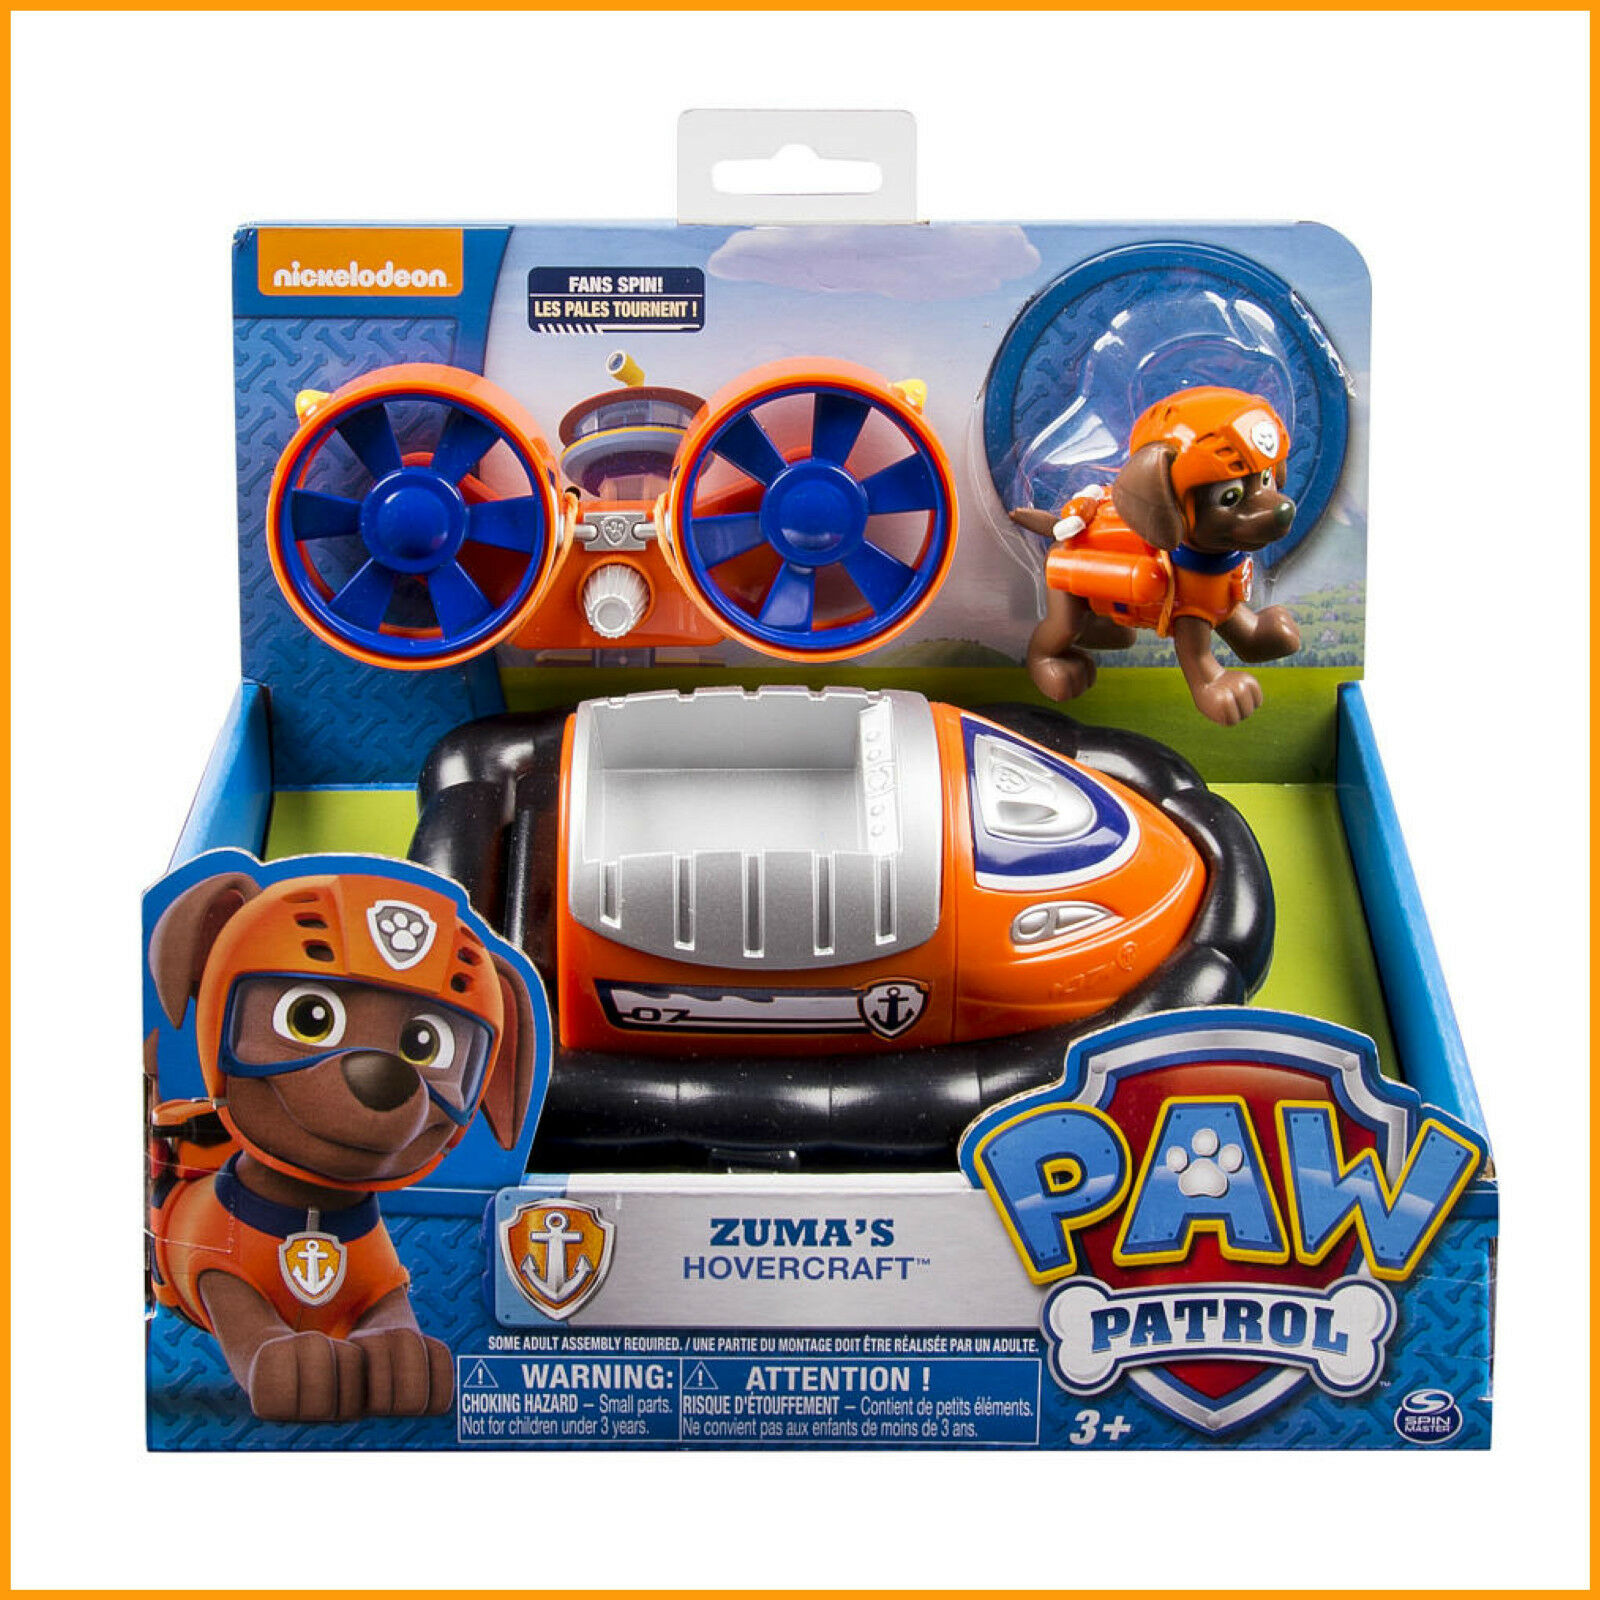 Paw Patrol Zuma Hovercraft Toy - Zuma Toys Paw Patrol - Aussie Seller  Authentic